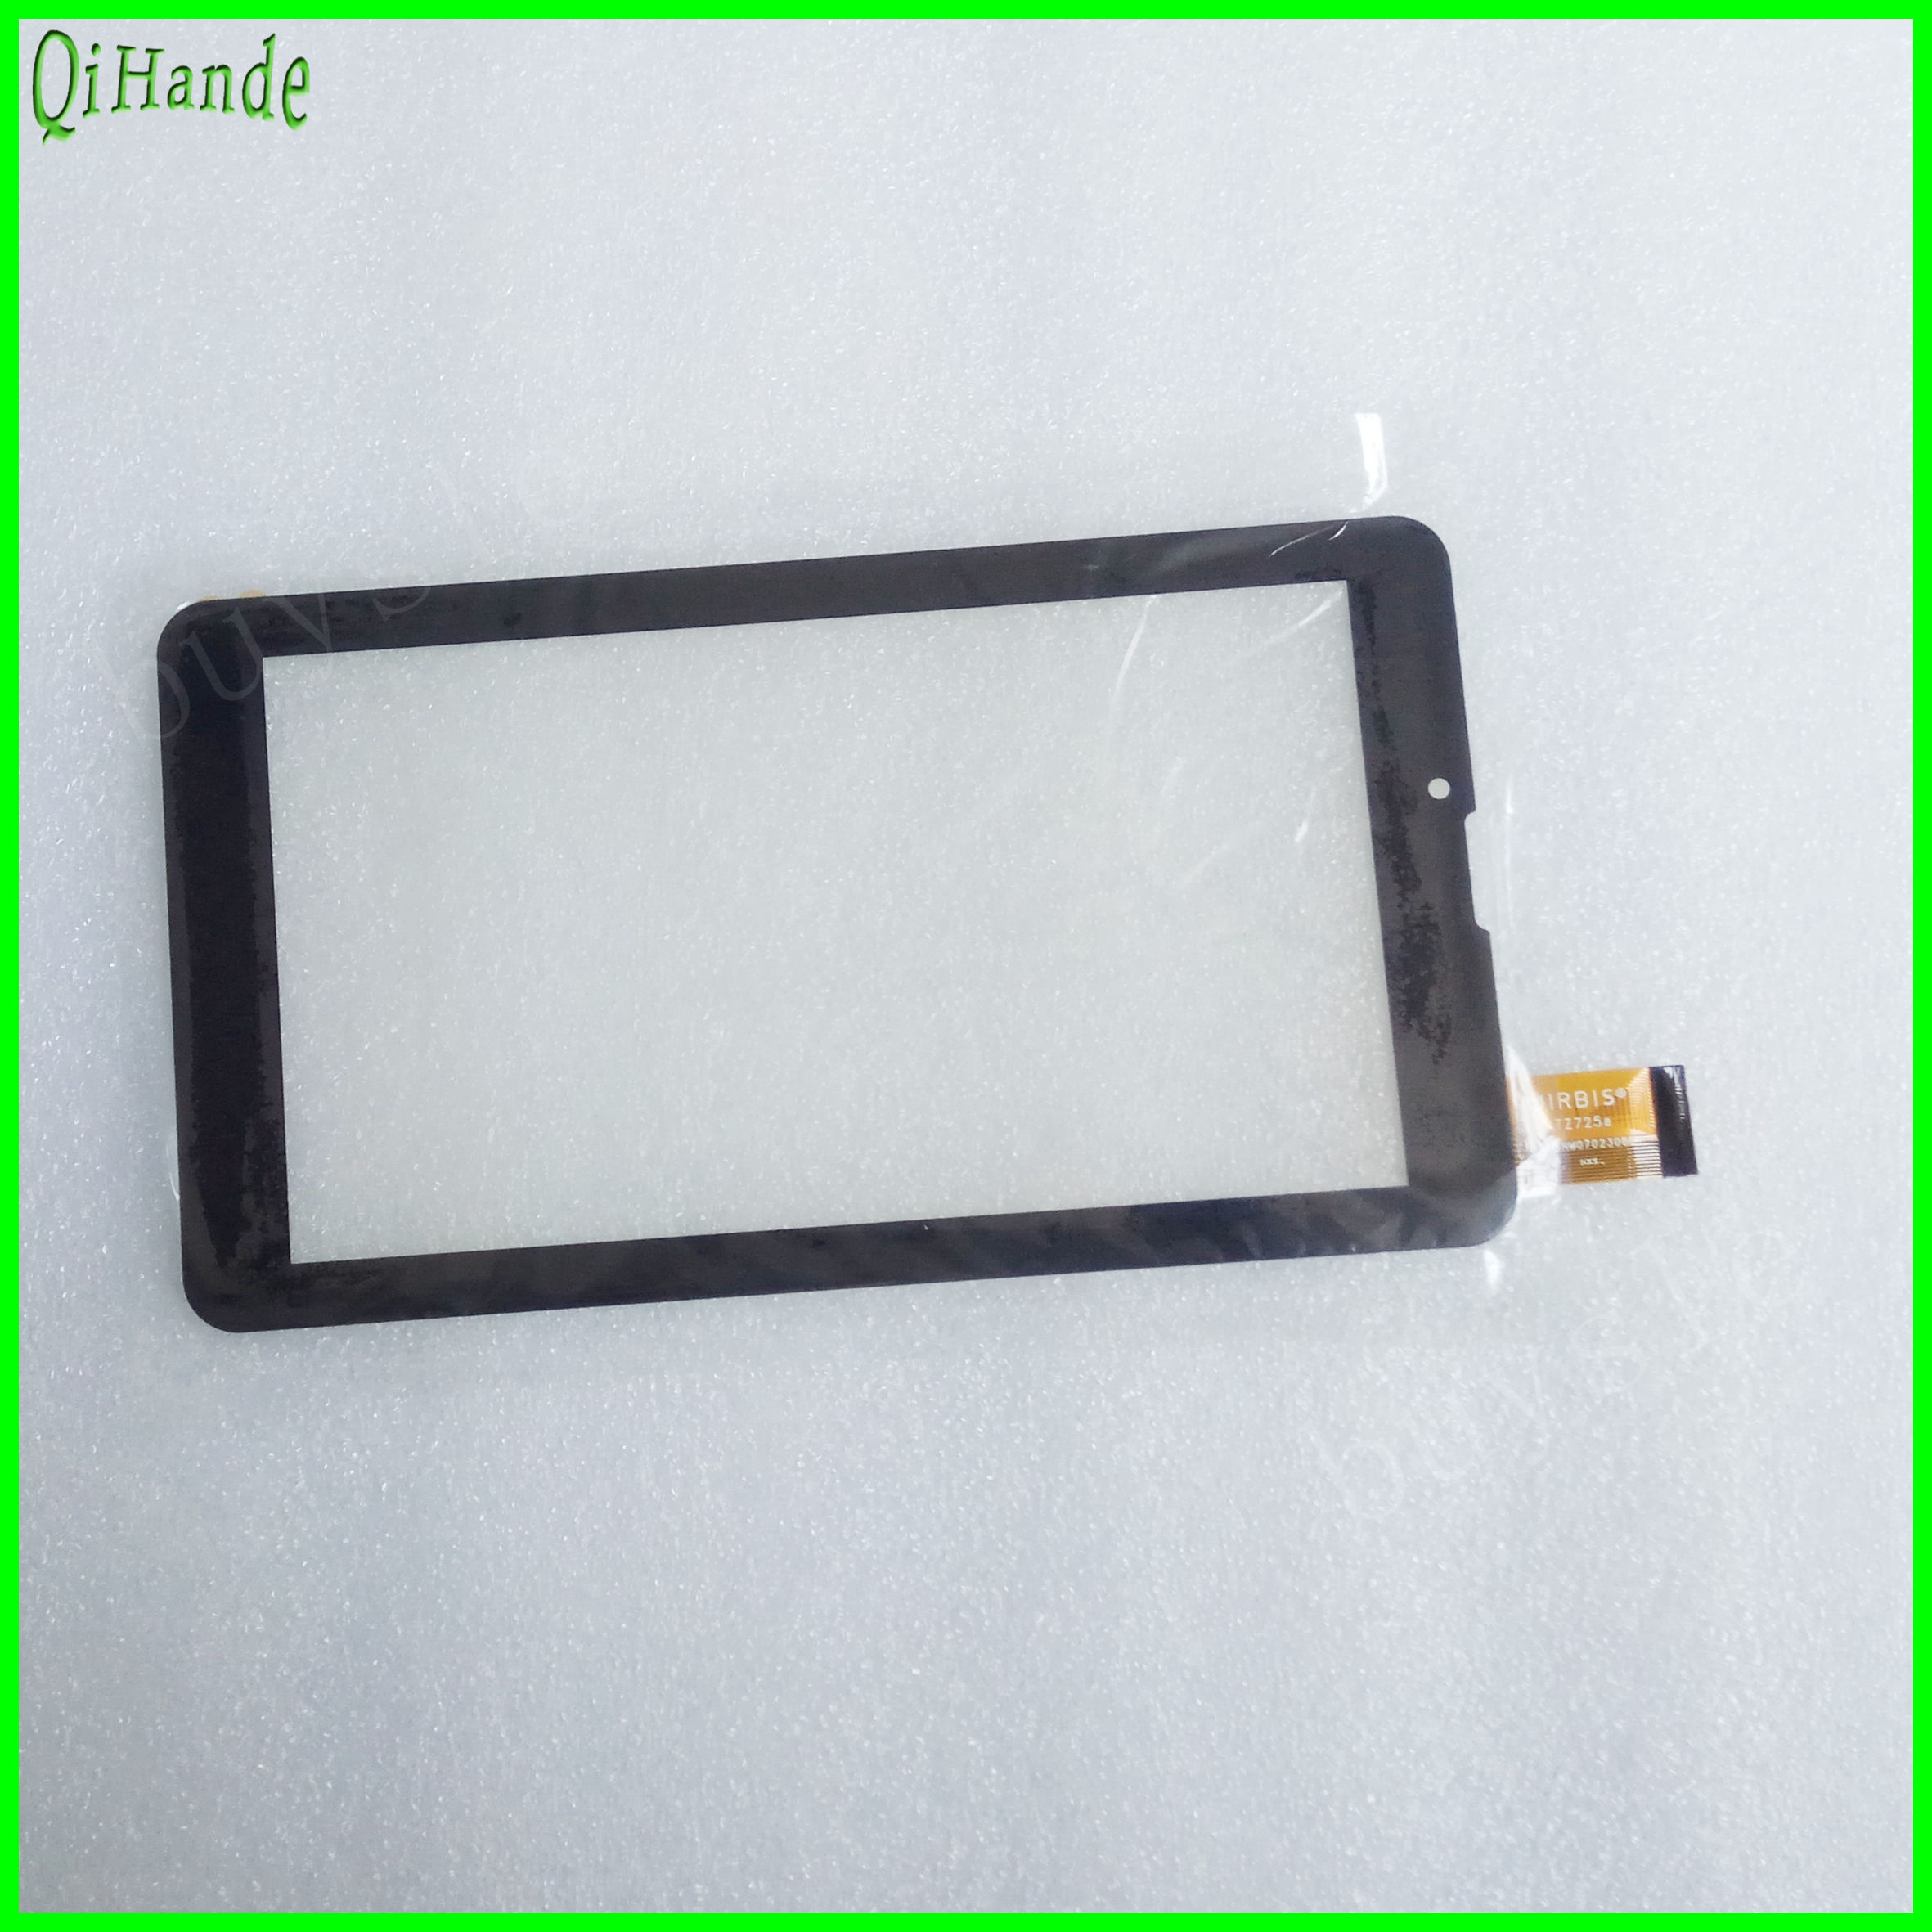 New 7inch Tablet Touch Screen XHSNM0702308B XHSNM0702301B XHSNM0702302B XHSNM0702303B XHSNM0702304B XHSNM0702305B